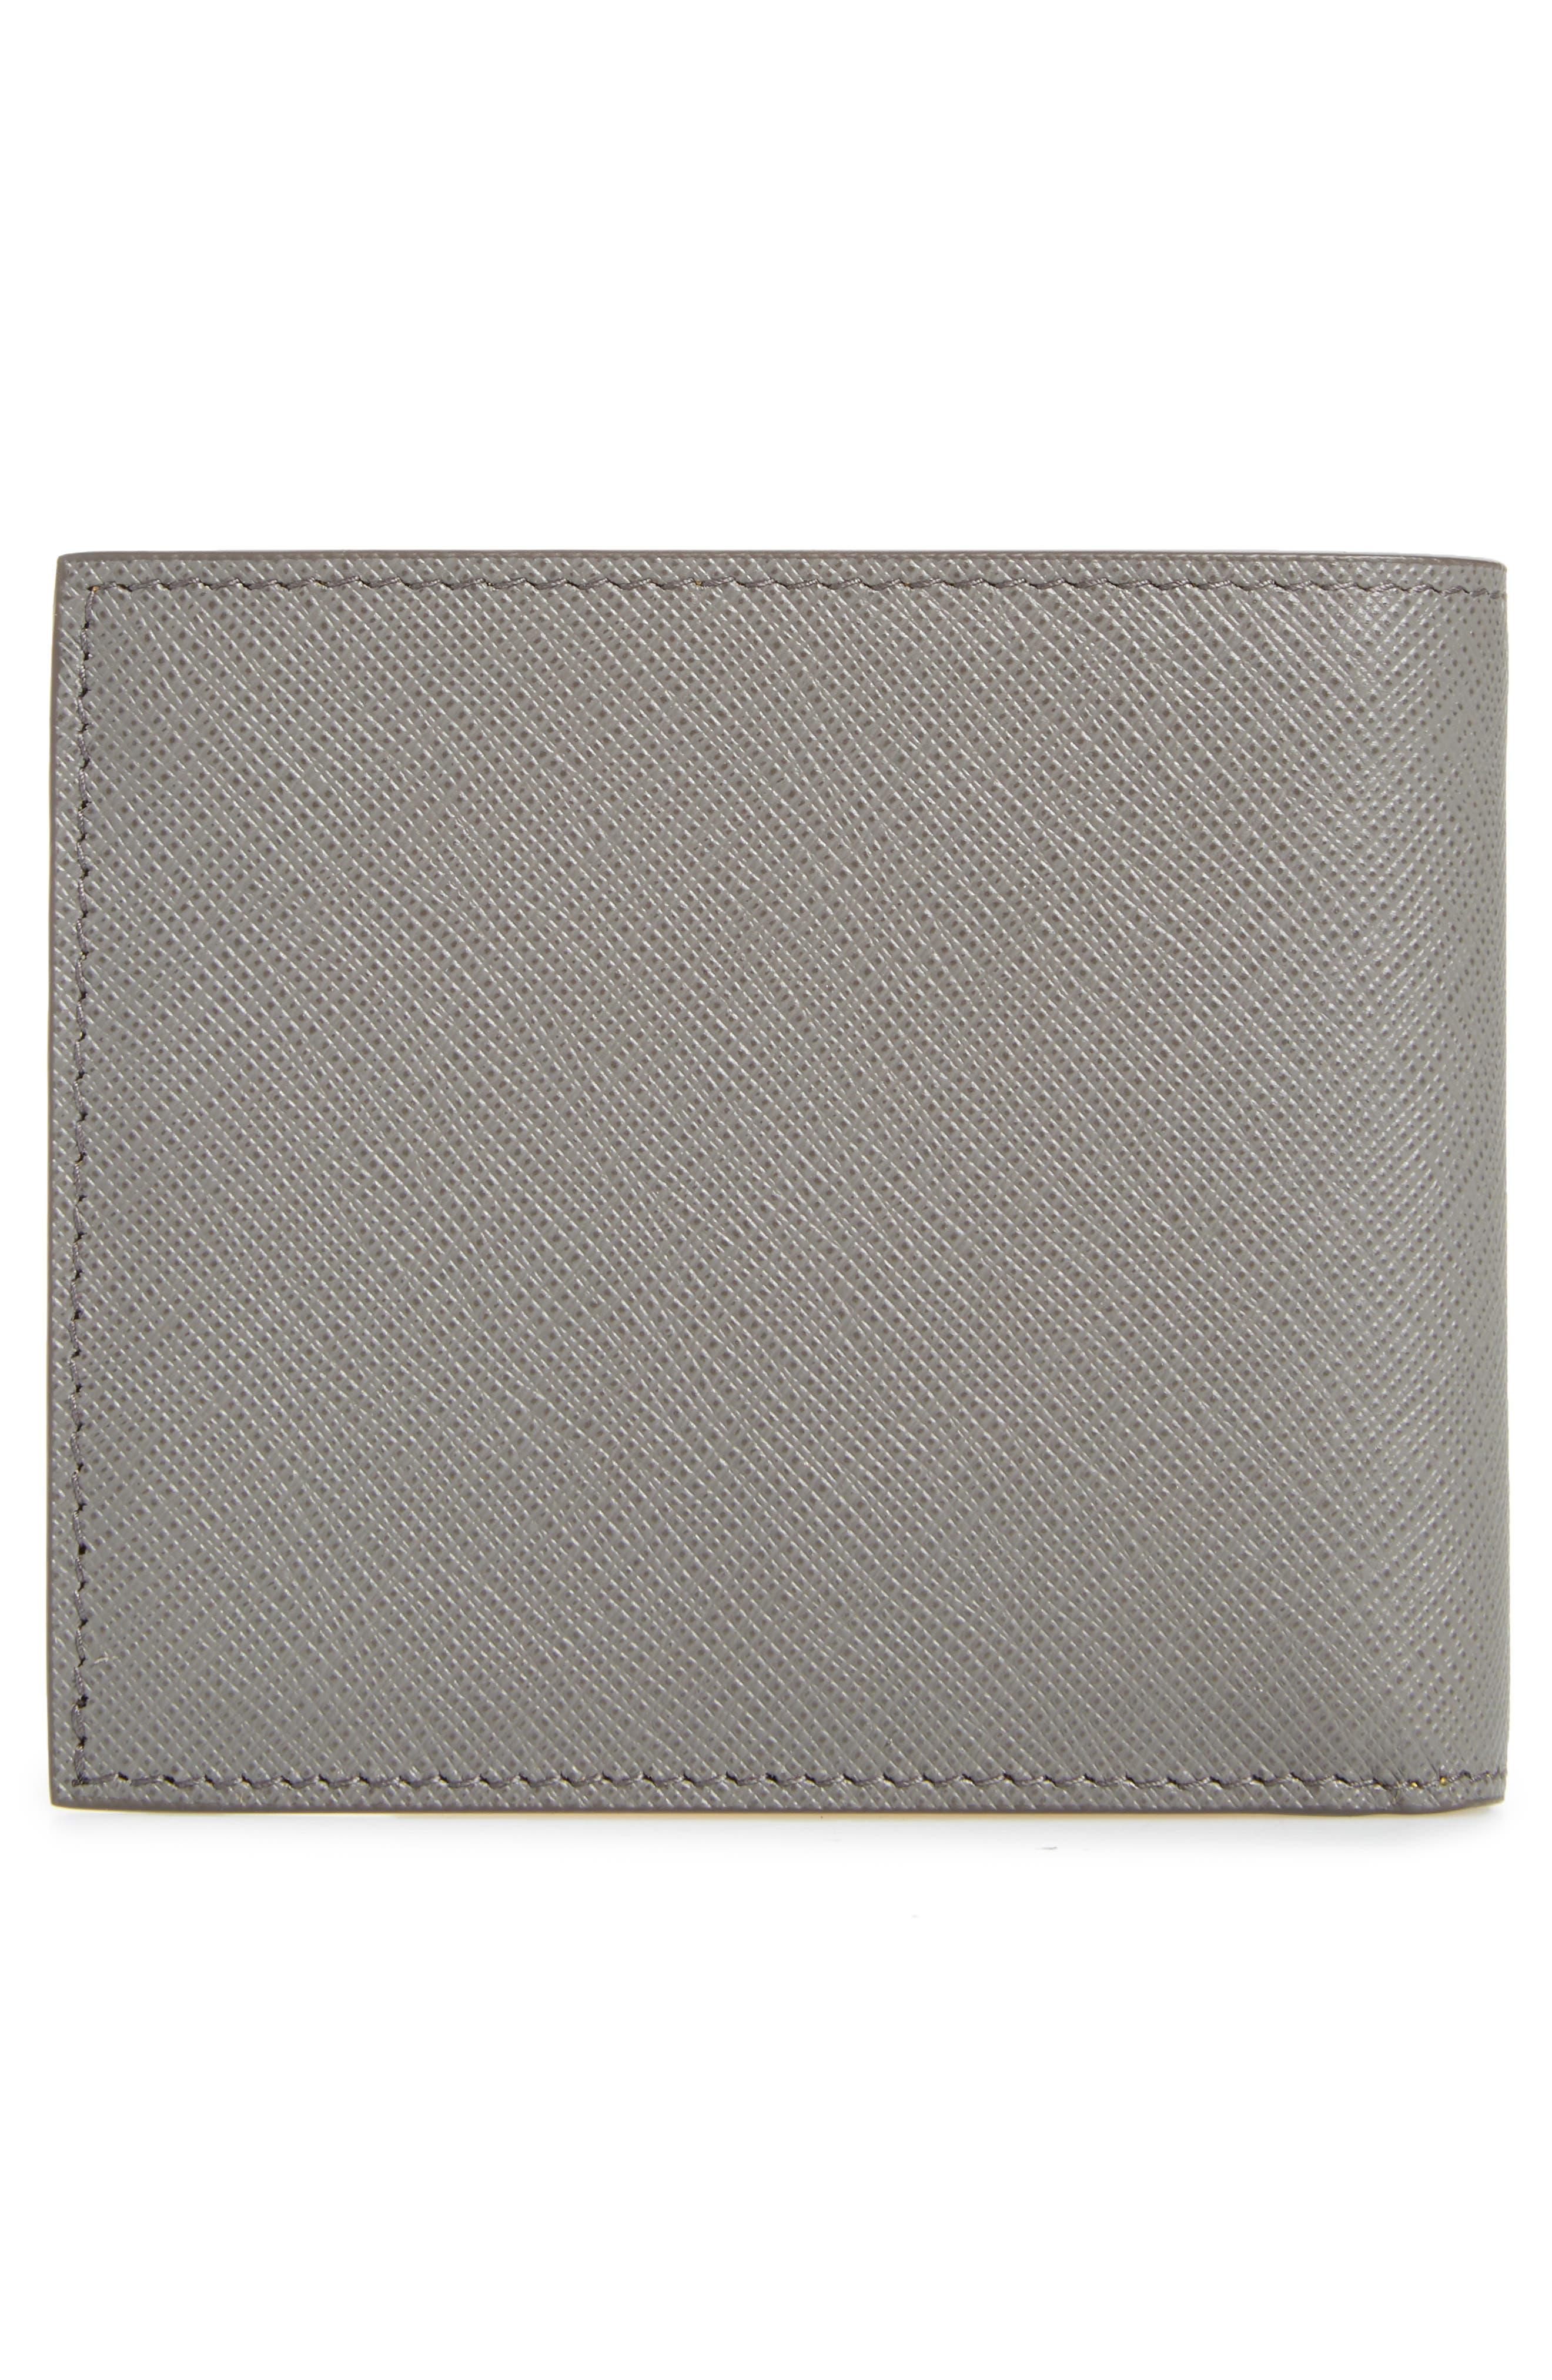 Alternate Image 3  - Prada Bicolor Leather Wallet